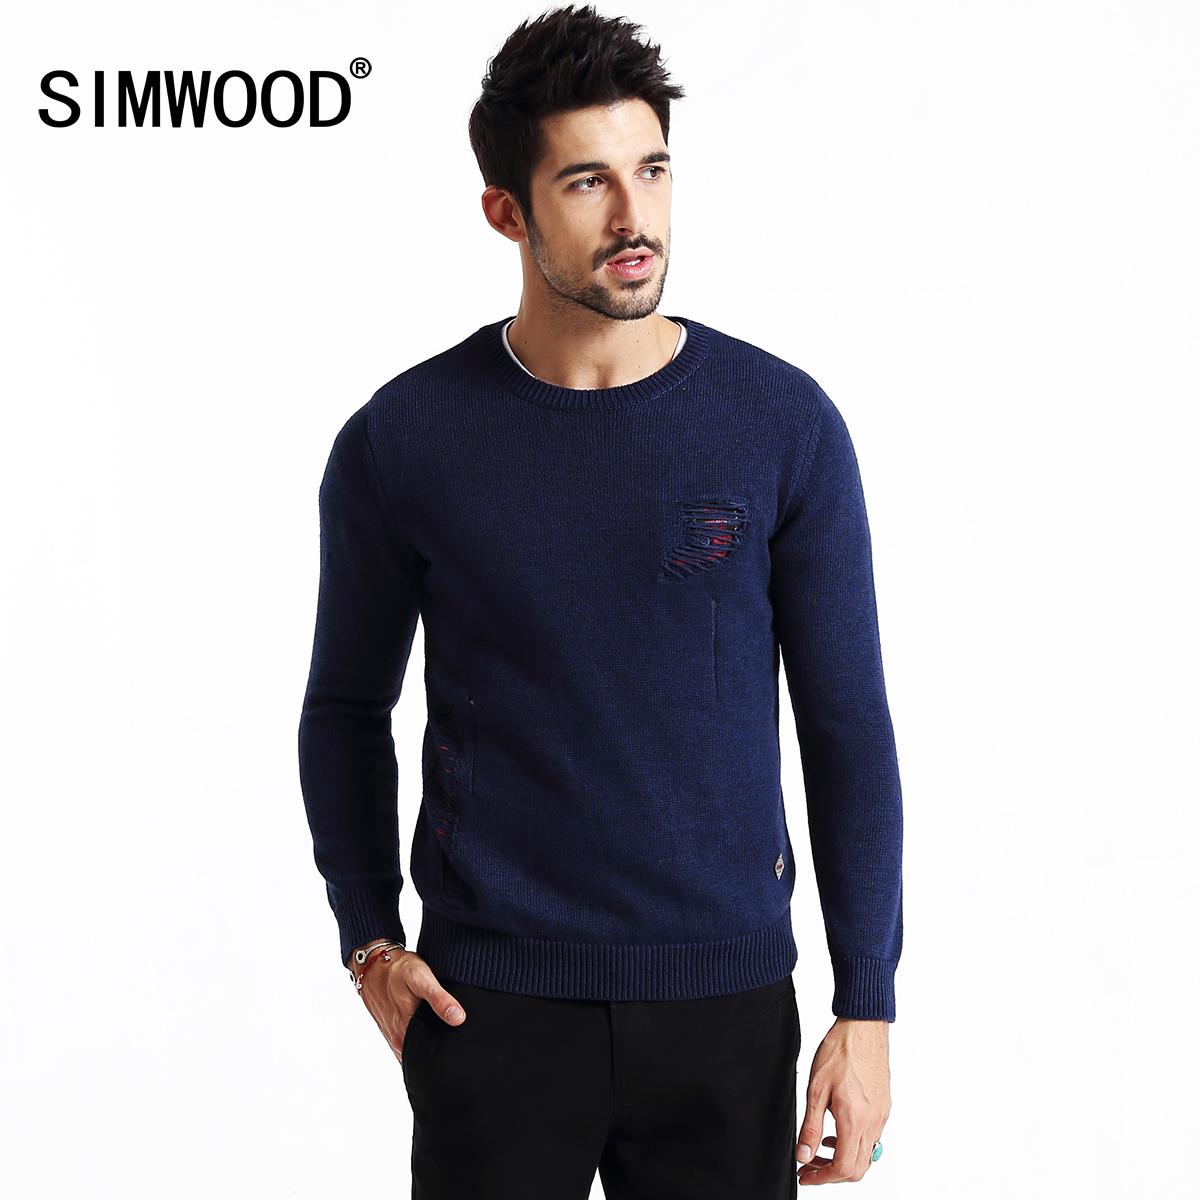 simwood男士羊毛圓領毛衣